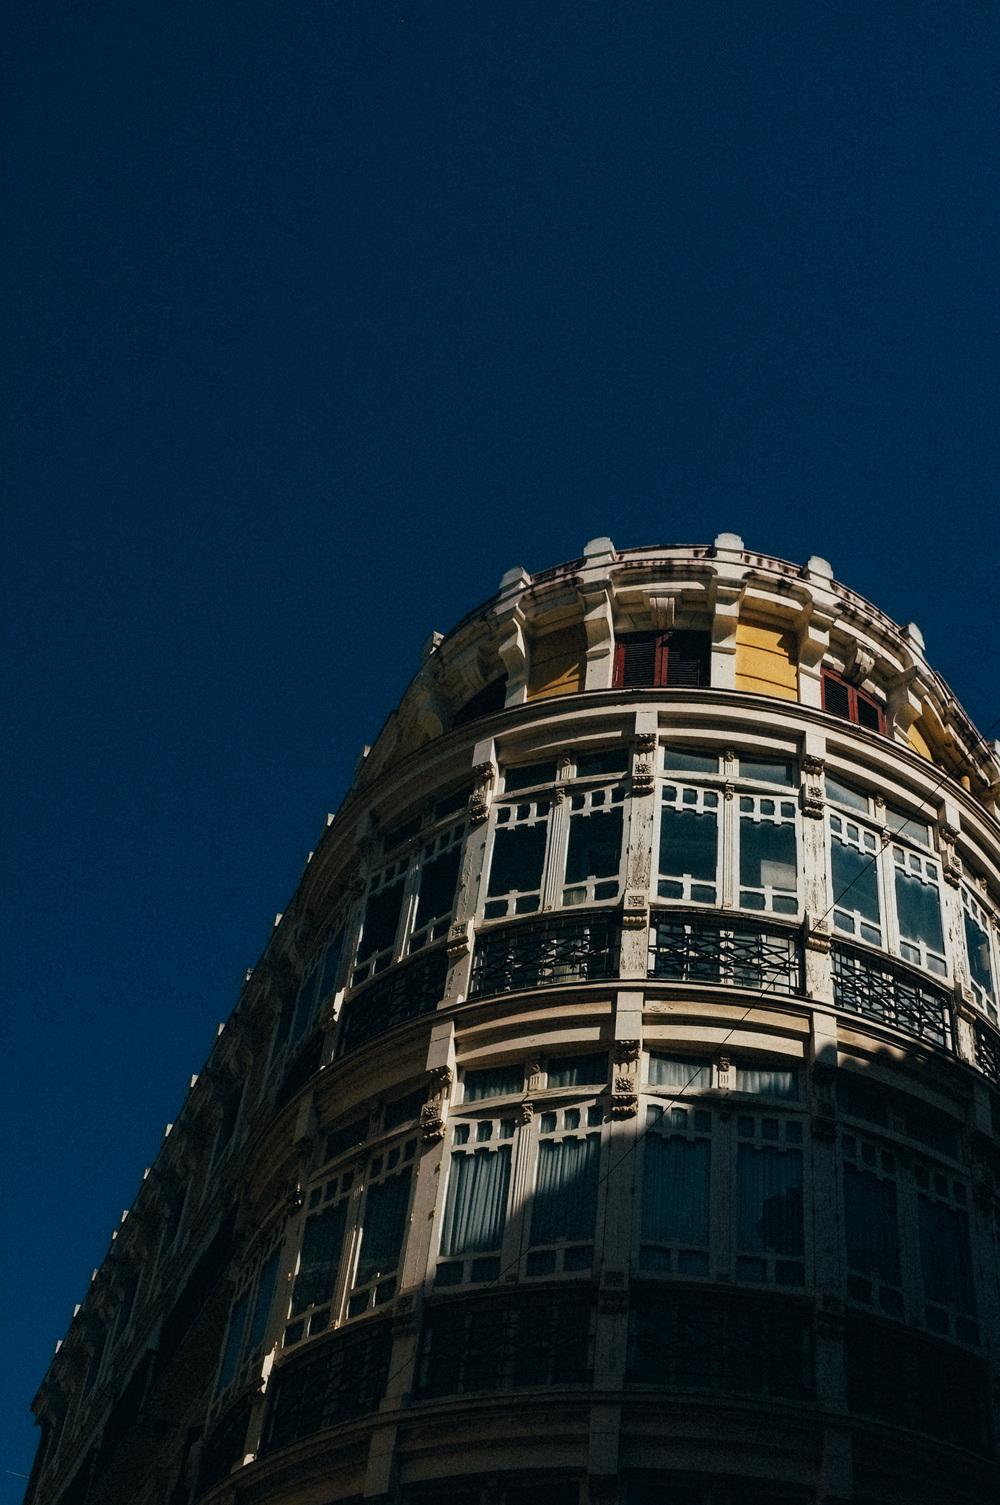 Malaga-blog-14.jpg